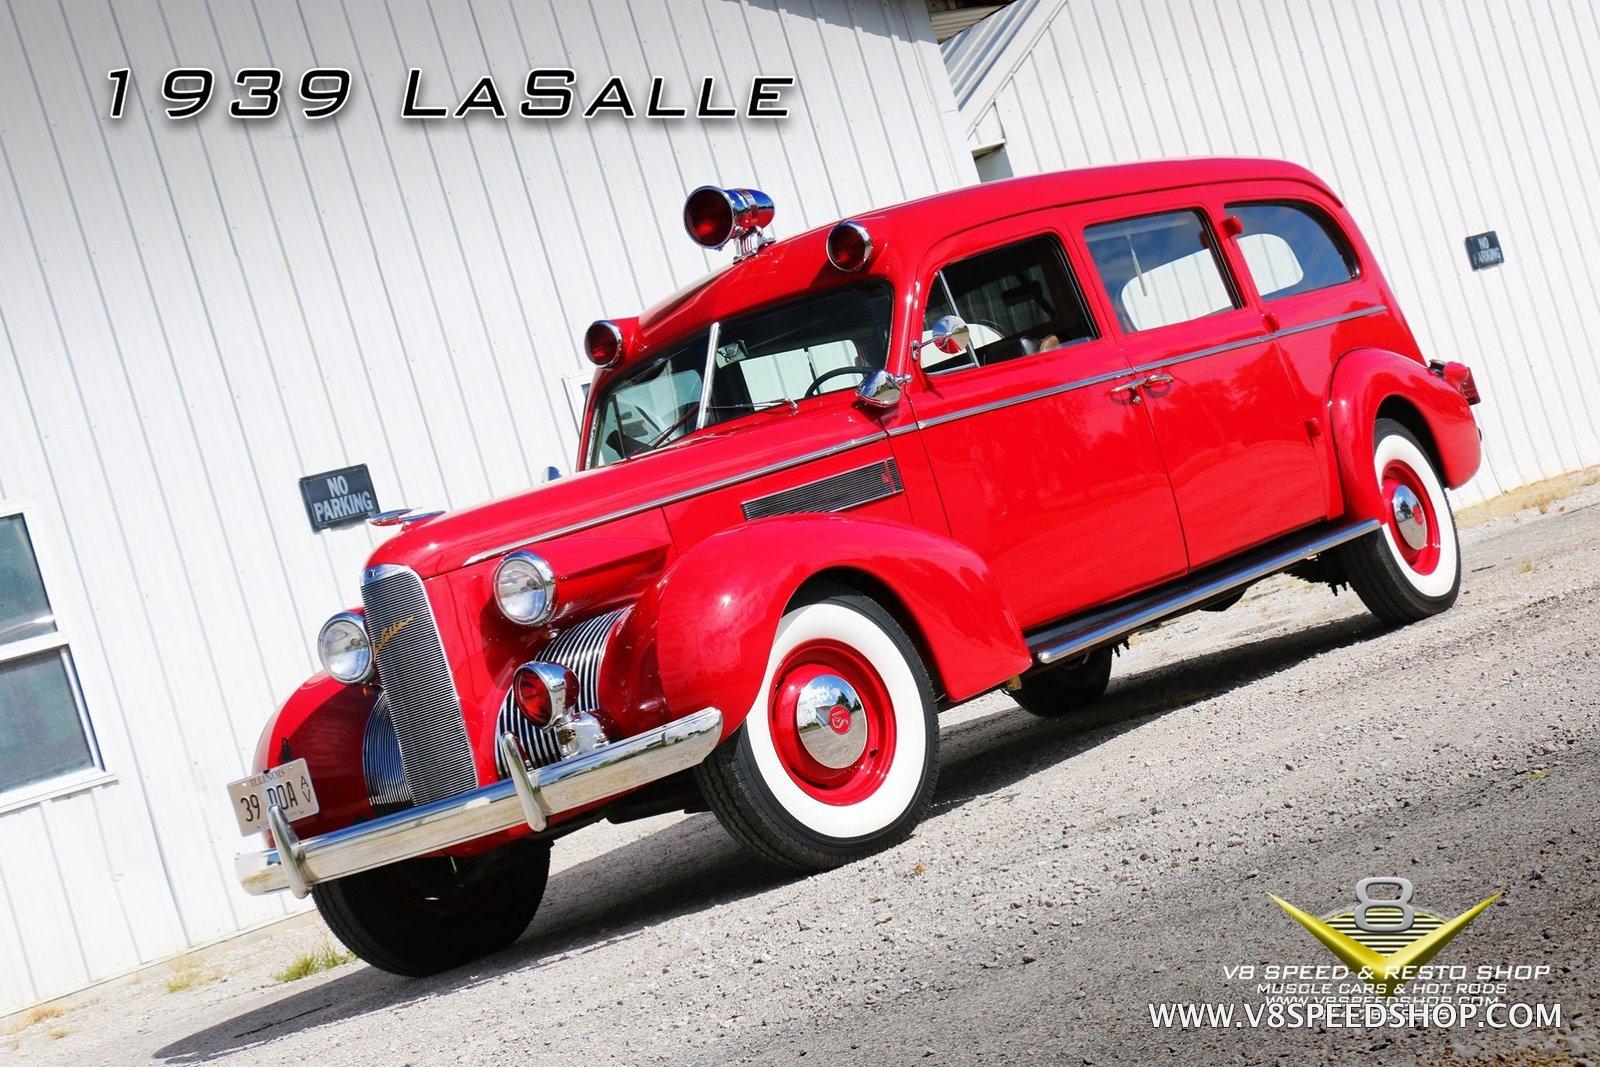 1939 LaSalle Ambulance Restoration Photo Gallery